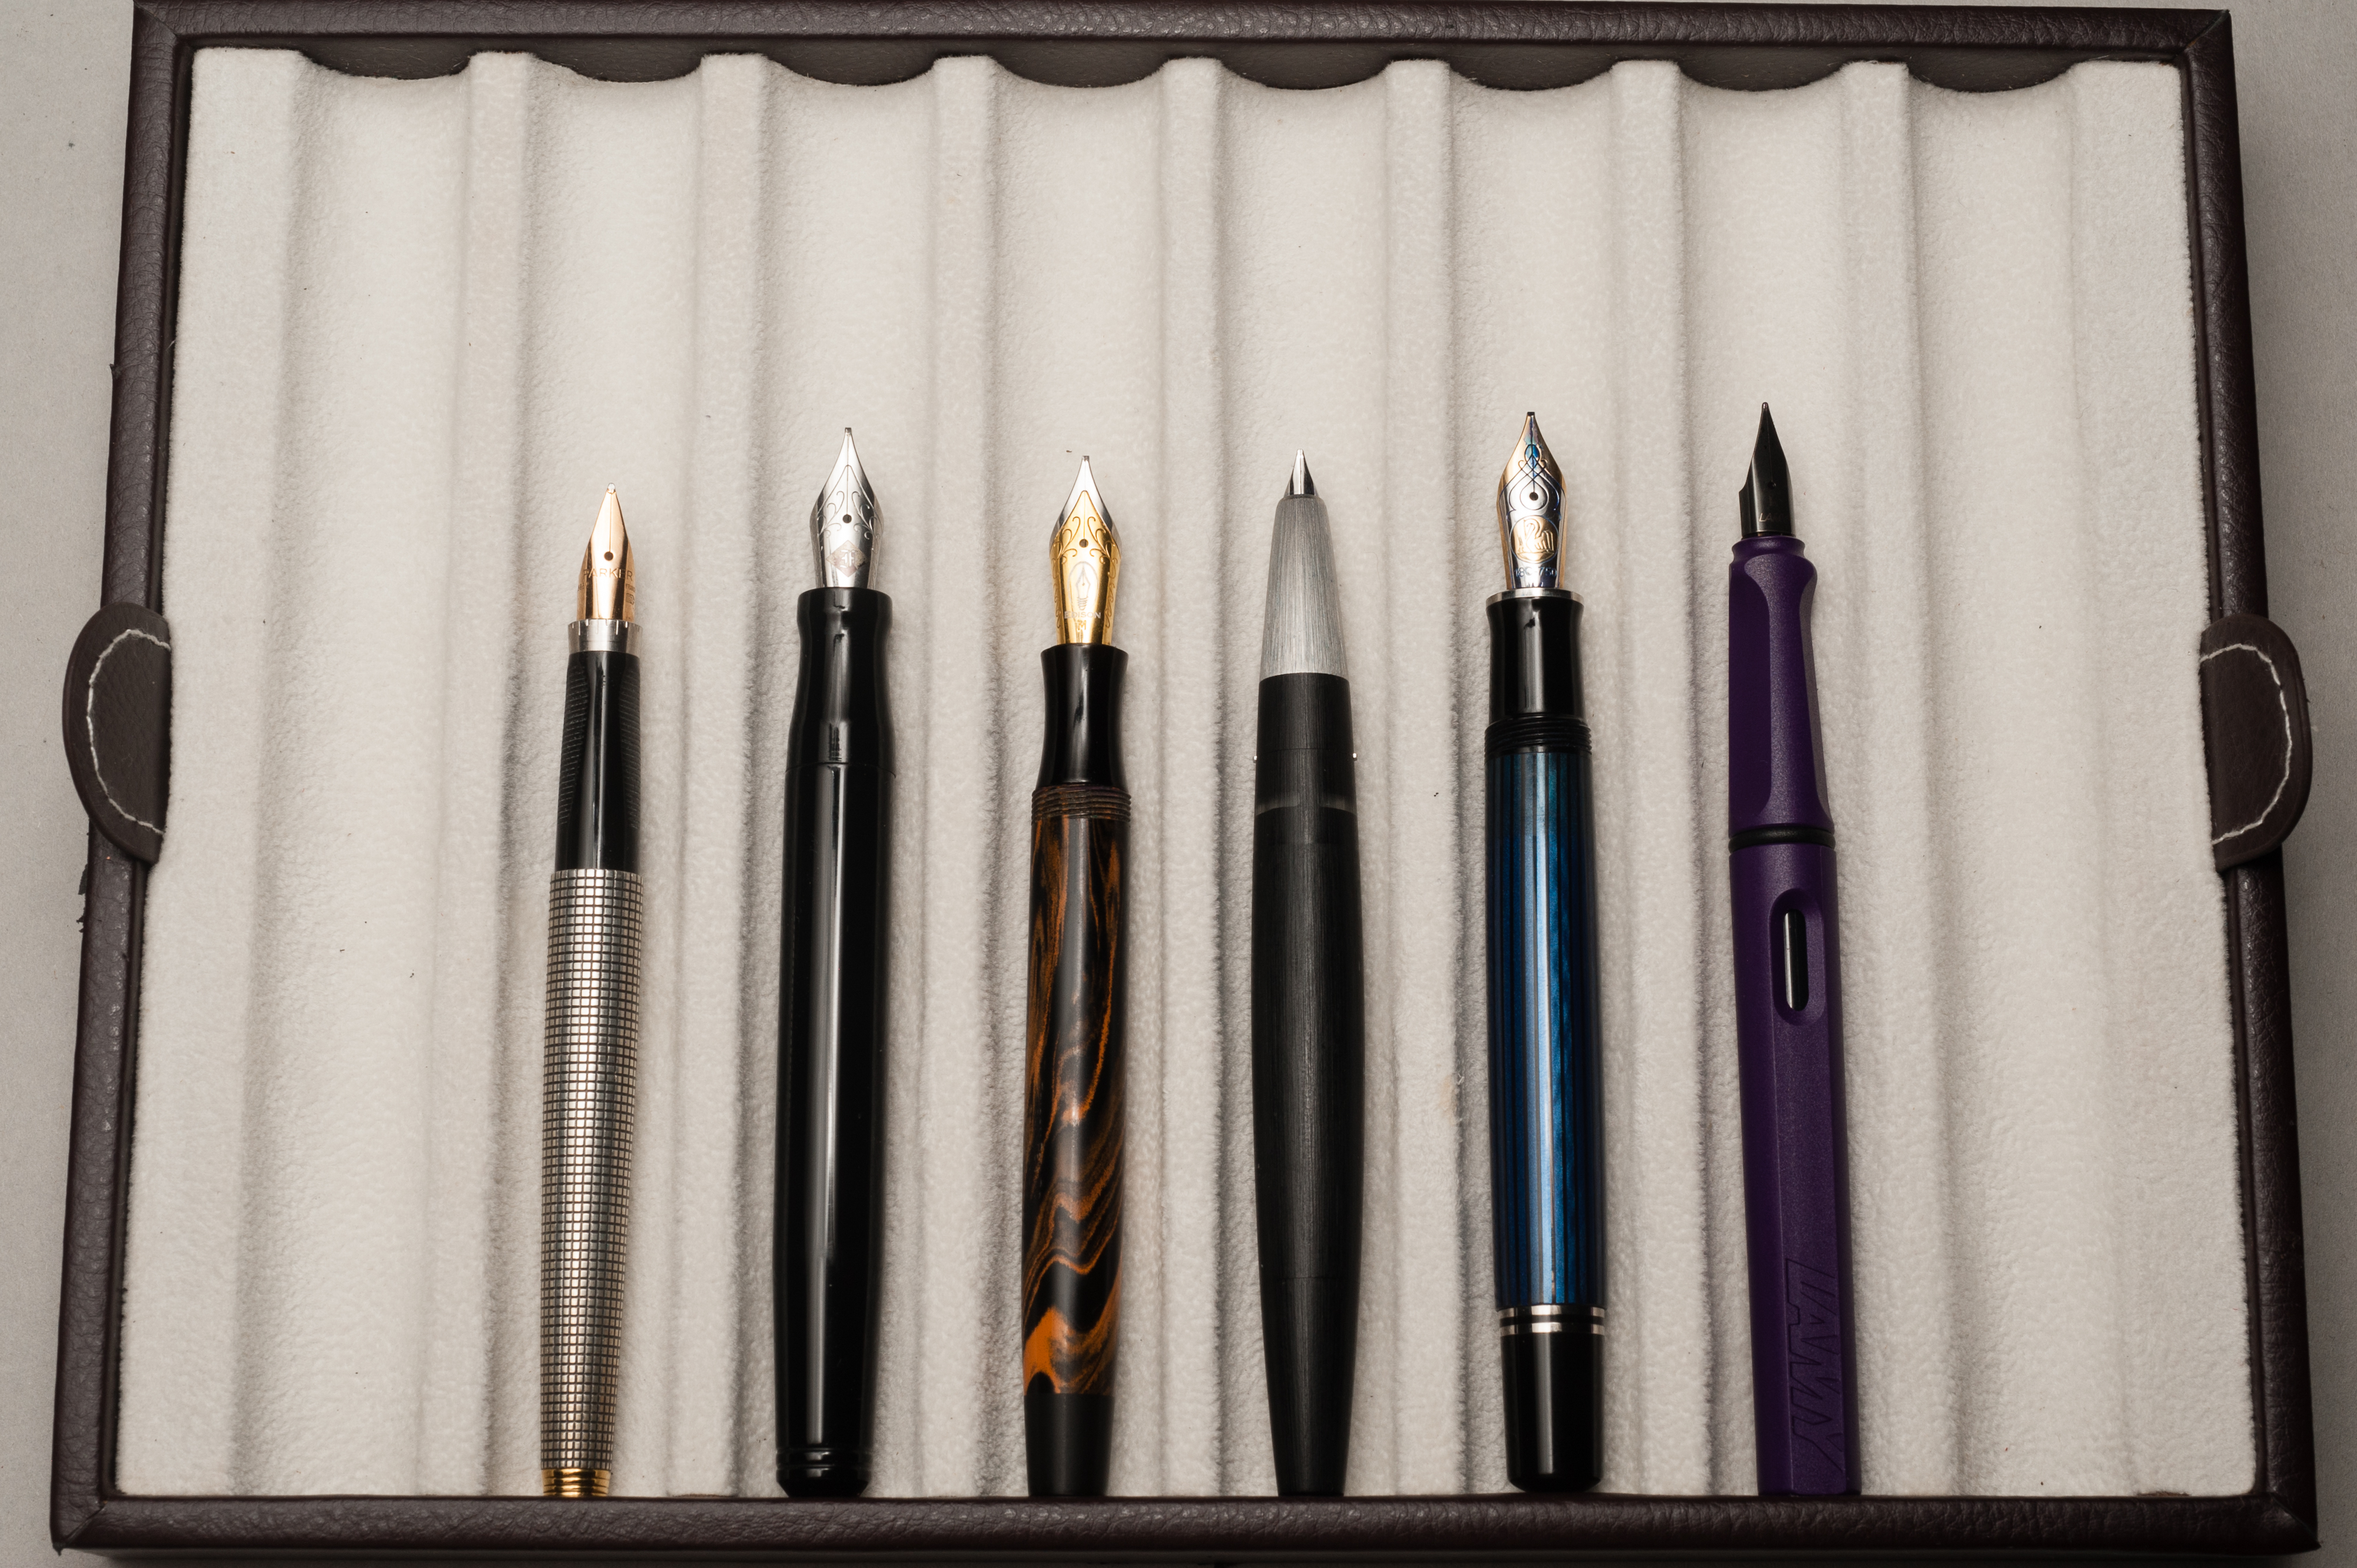 20160709_HOTP Pen Comp Lamy 2000_003